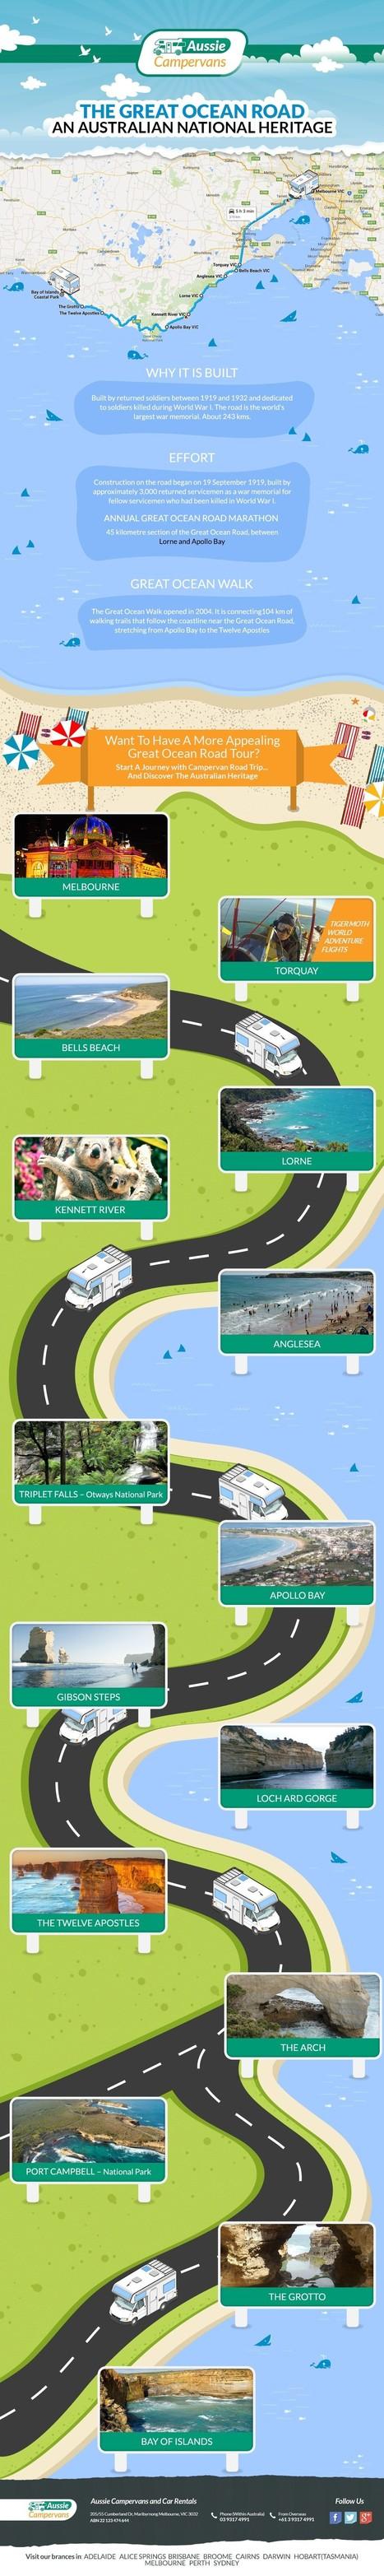 Great Ocean Road - Australia's Amazing National Heritage | All Infographics | Scoop.it